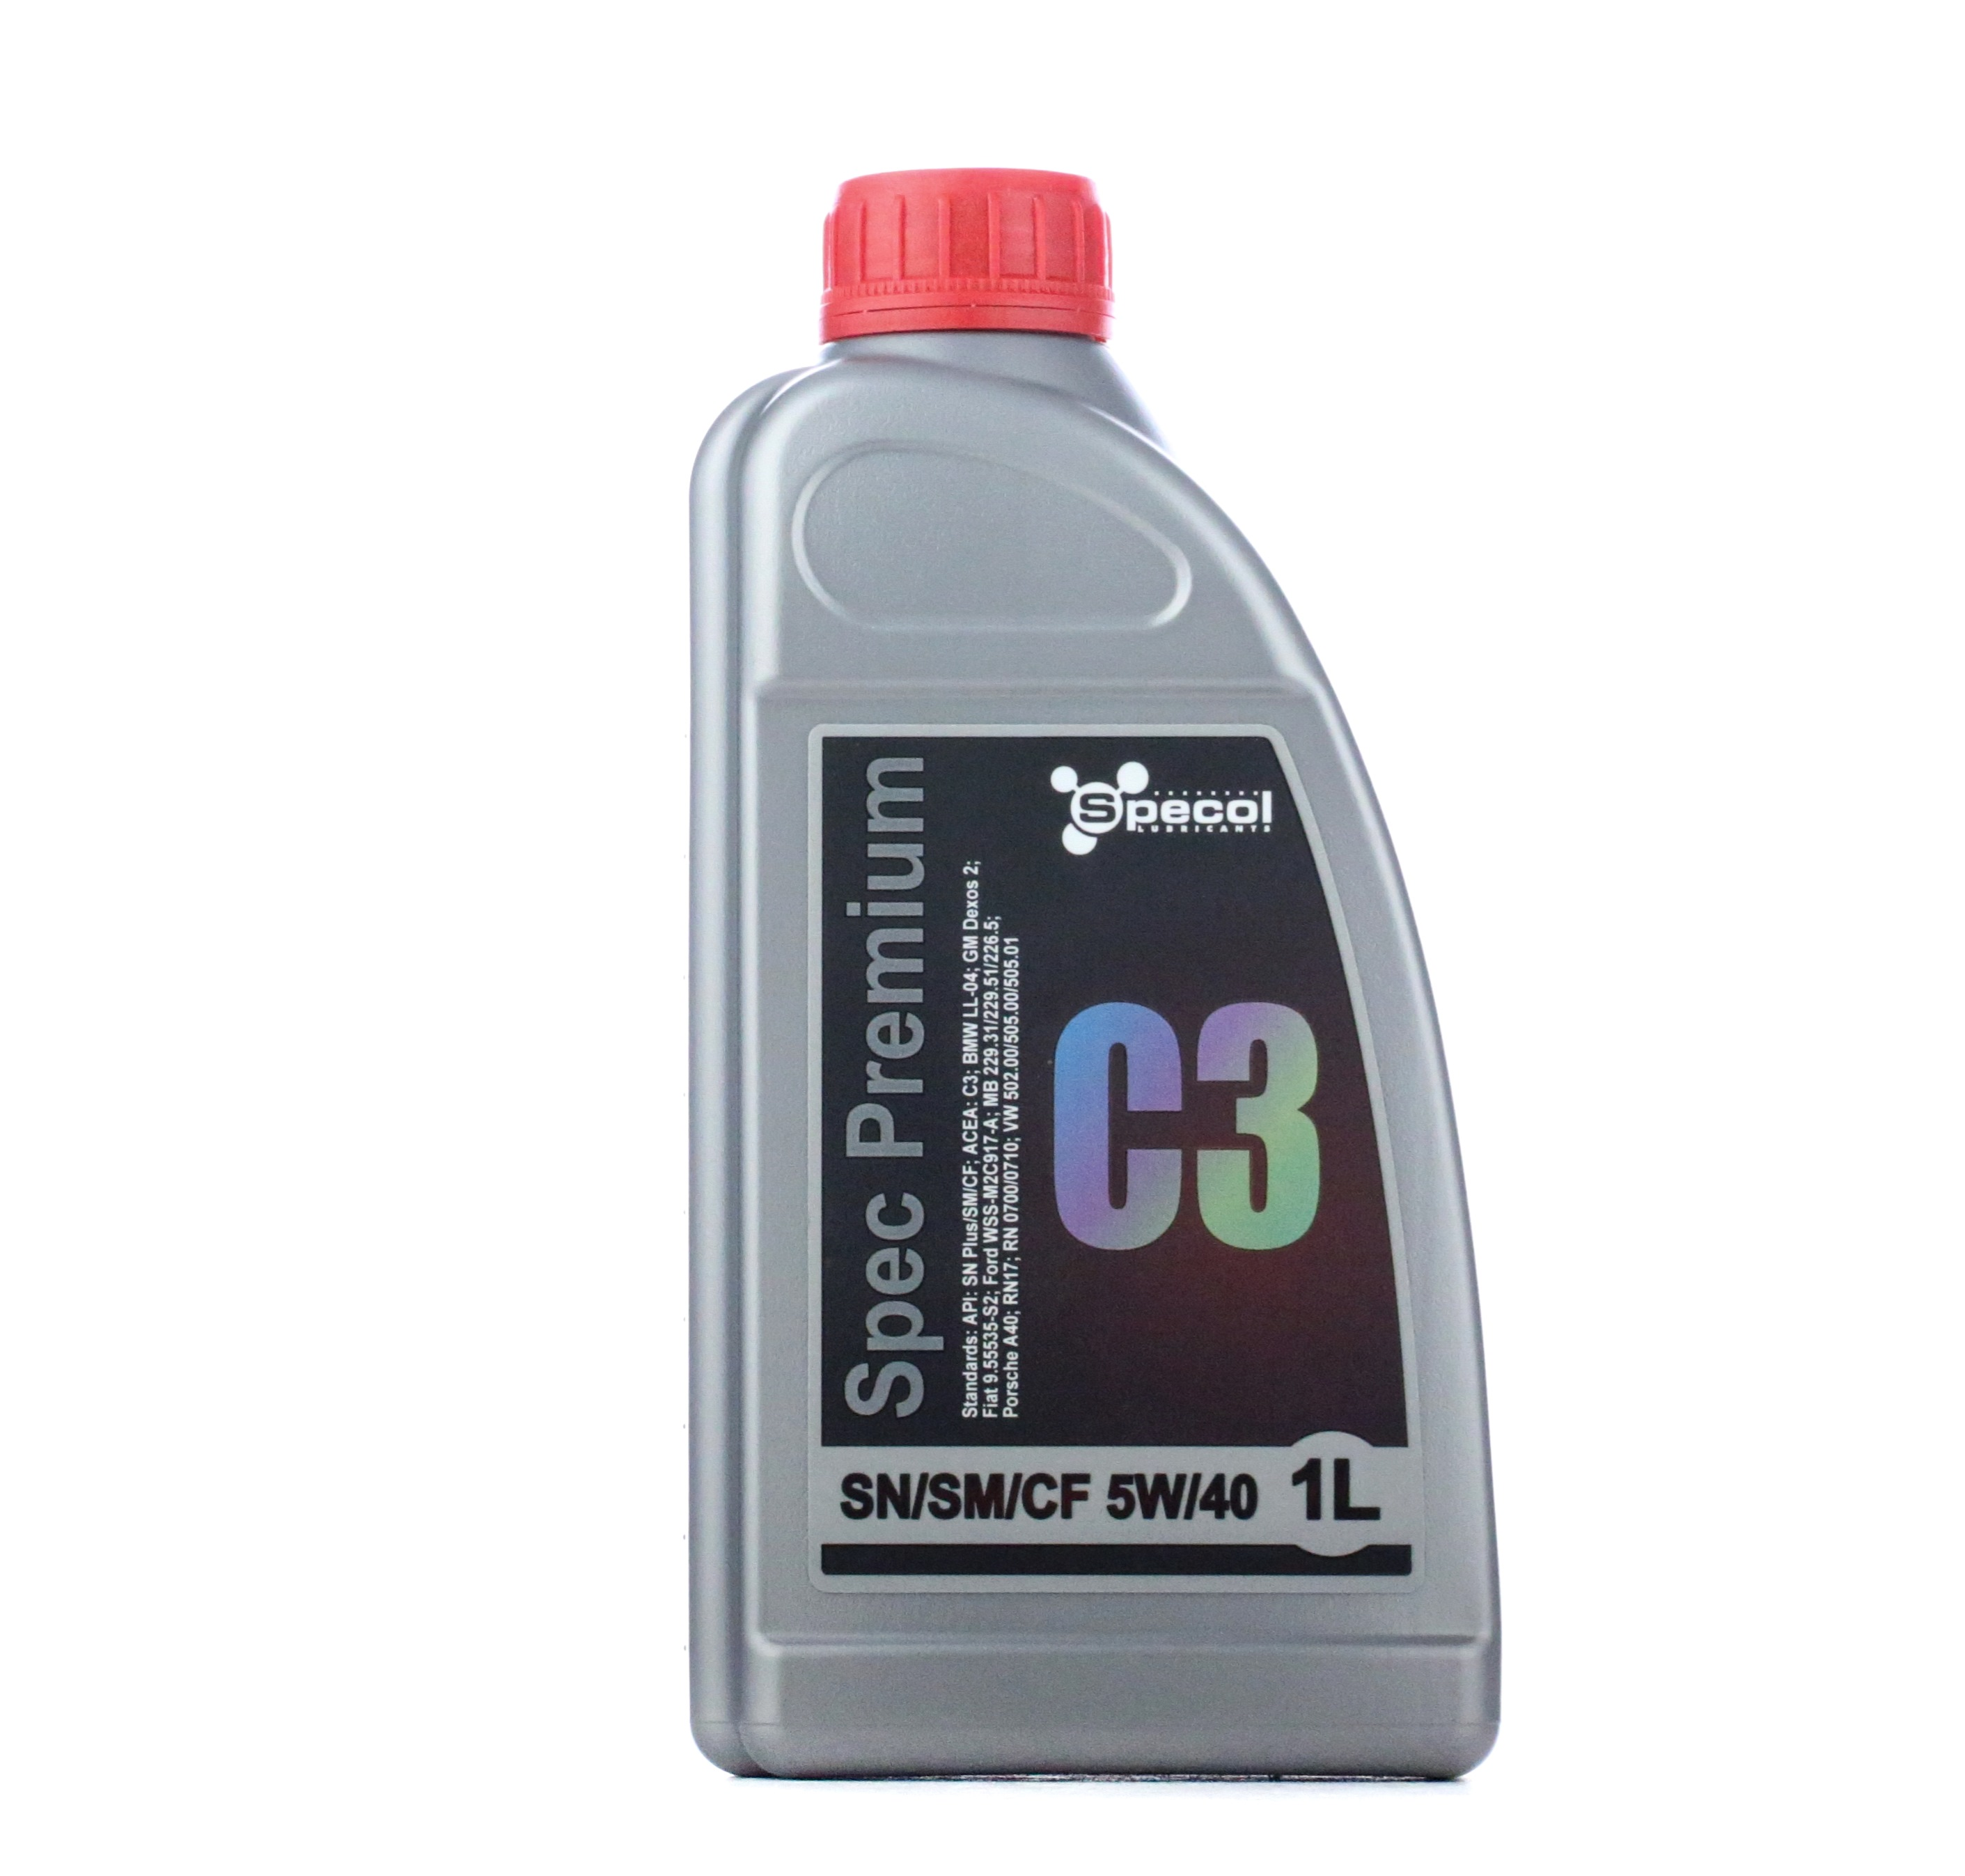 Motorenöl SPECOL 101987